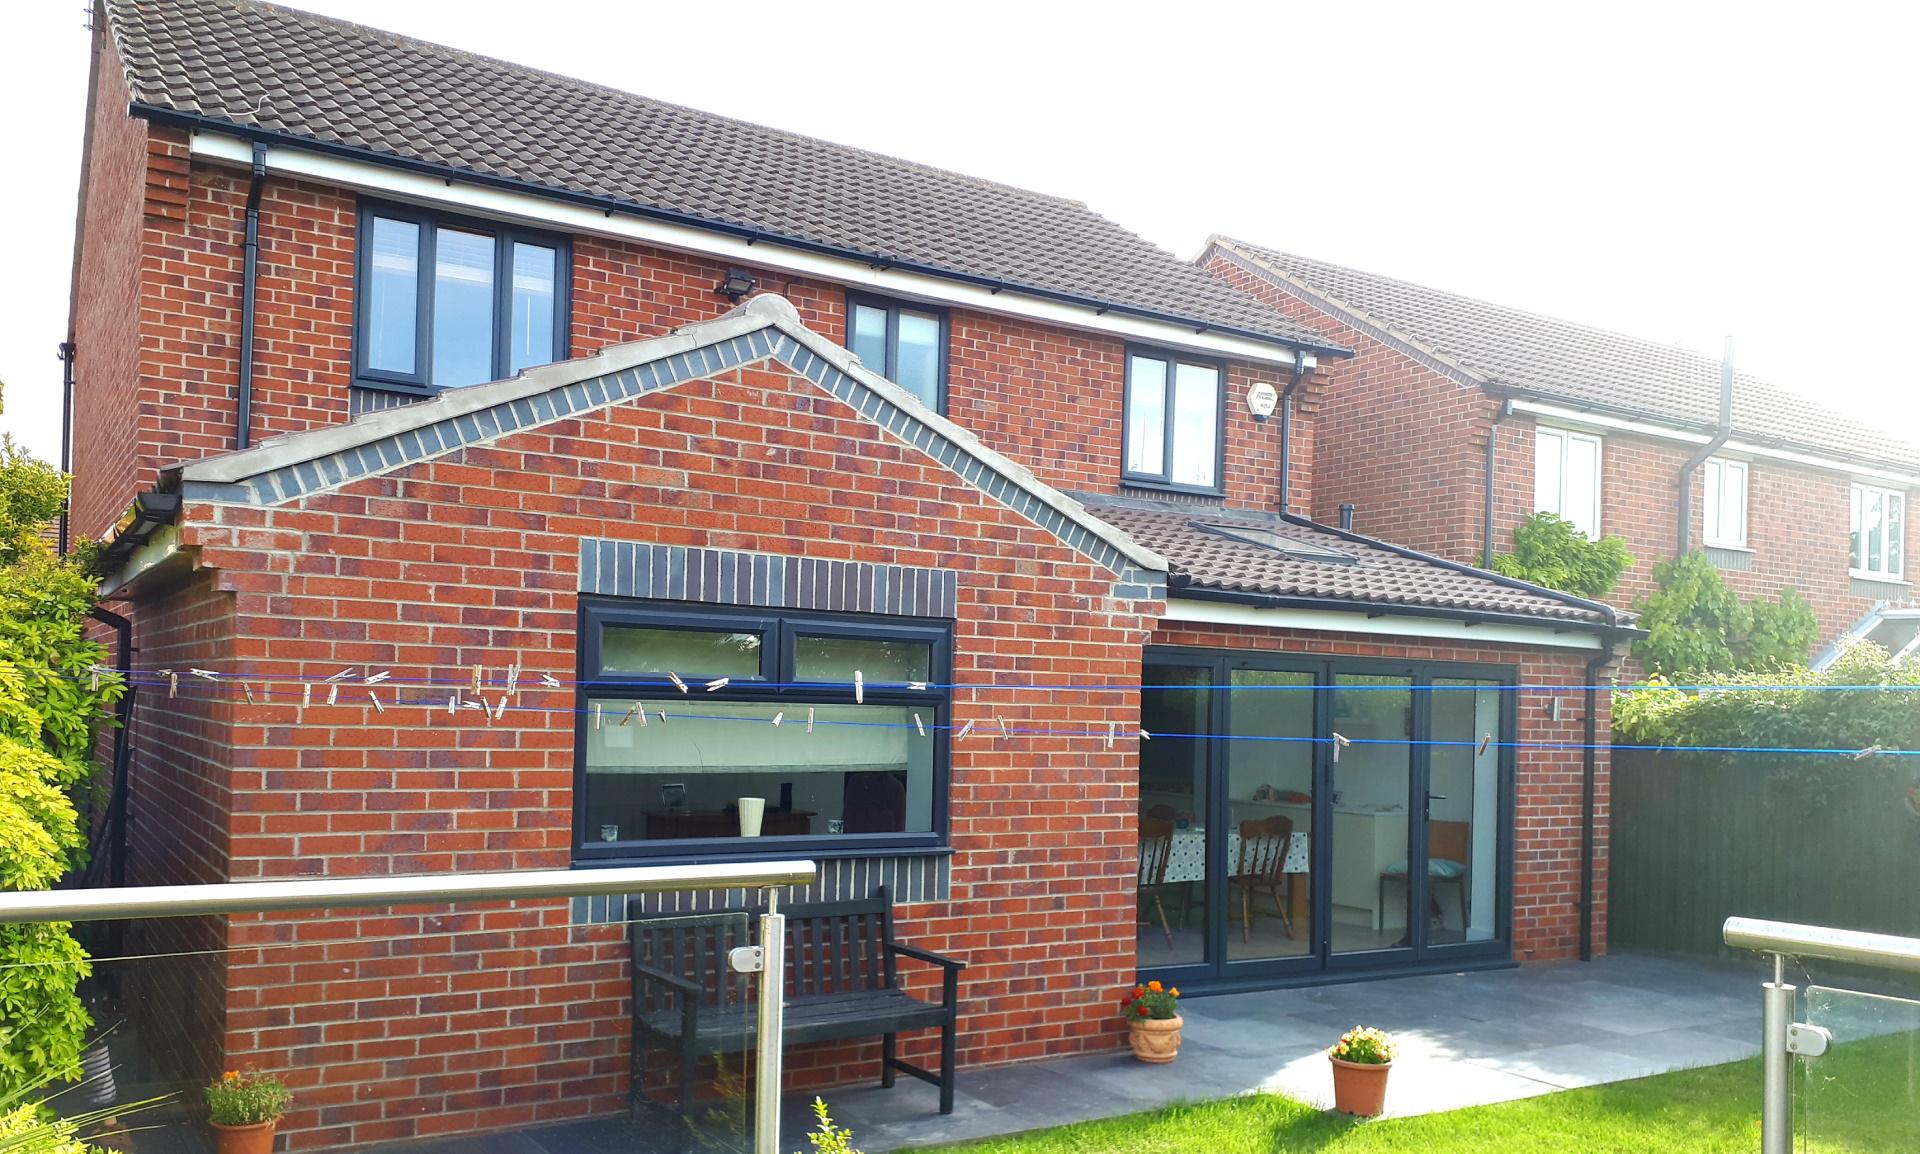 Garden view of single storey extension with bifold doors